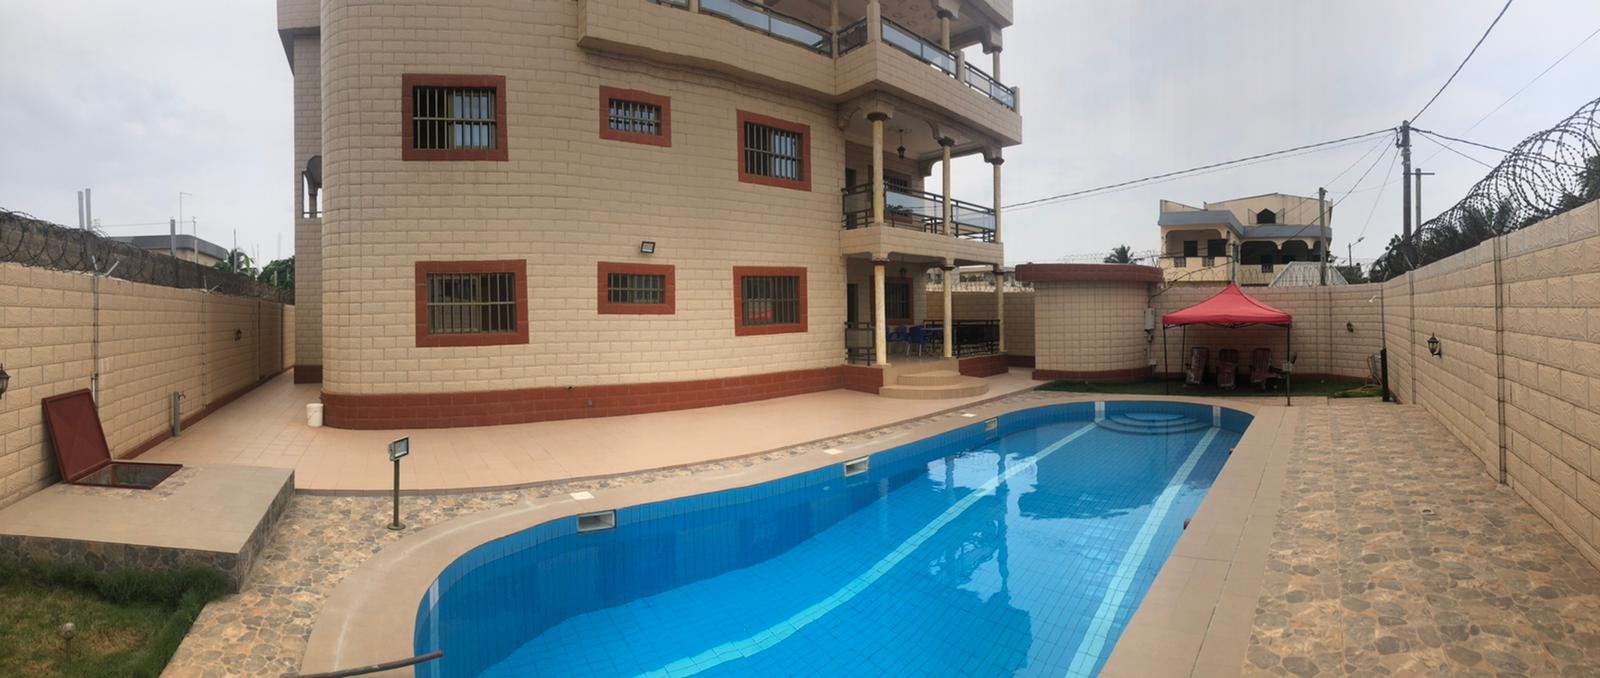 A louer: Villa de standind meublée à piscine, Léo 2000.